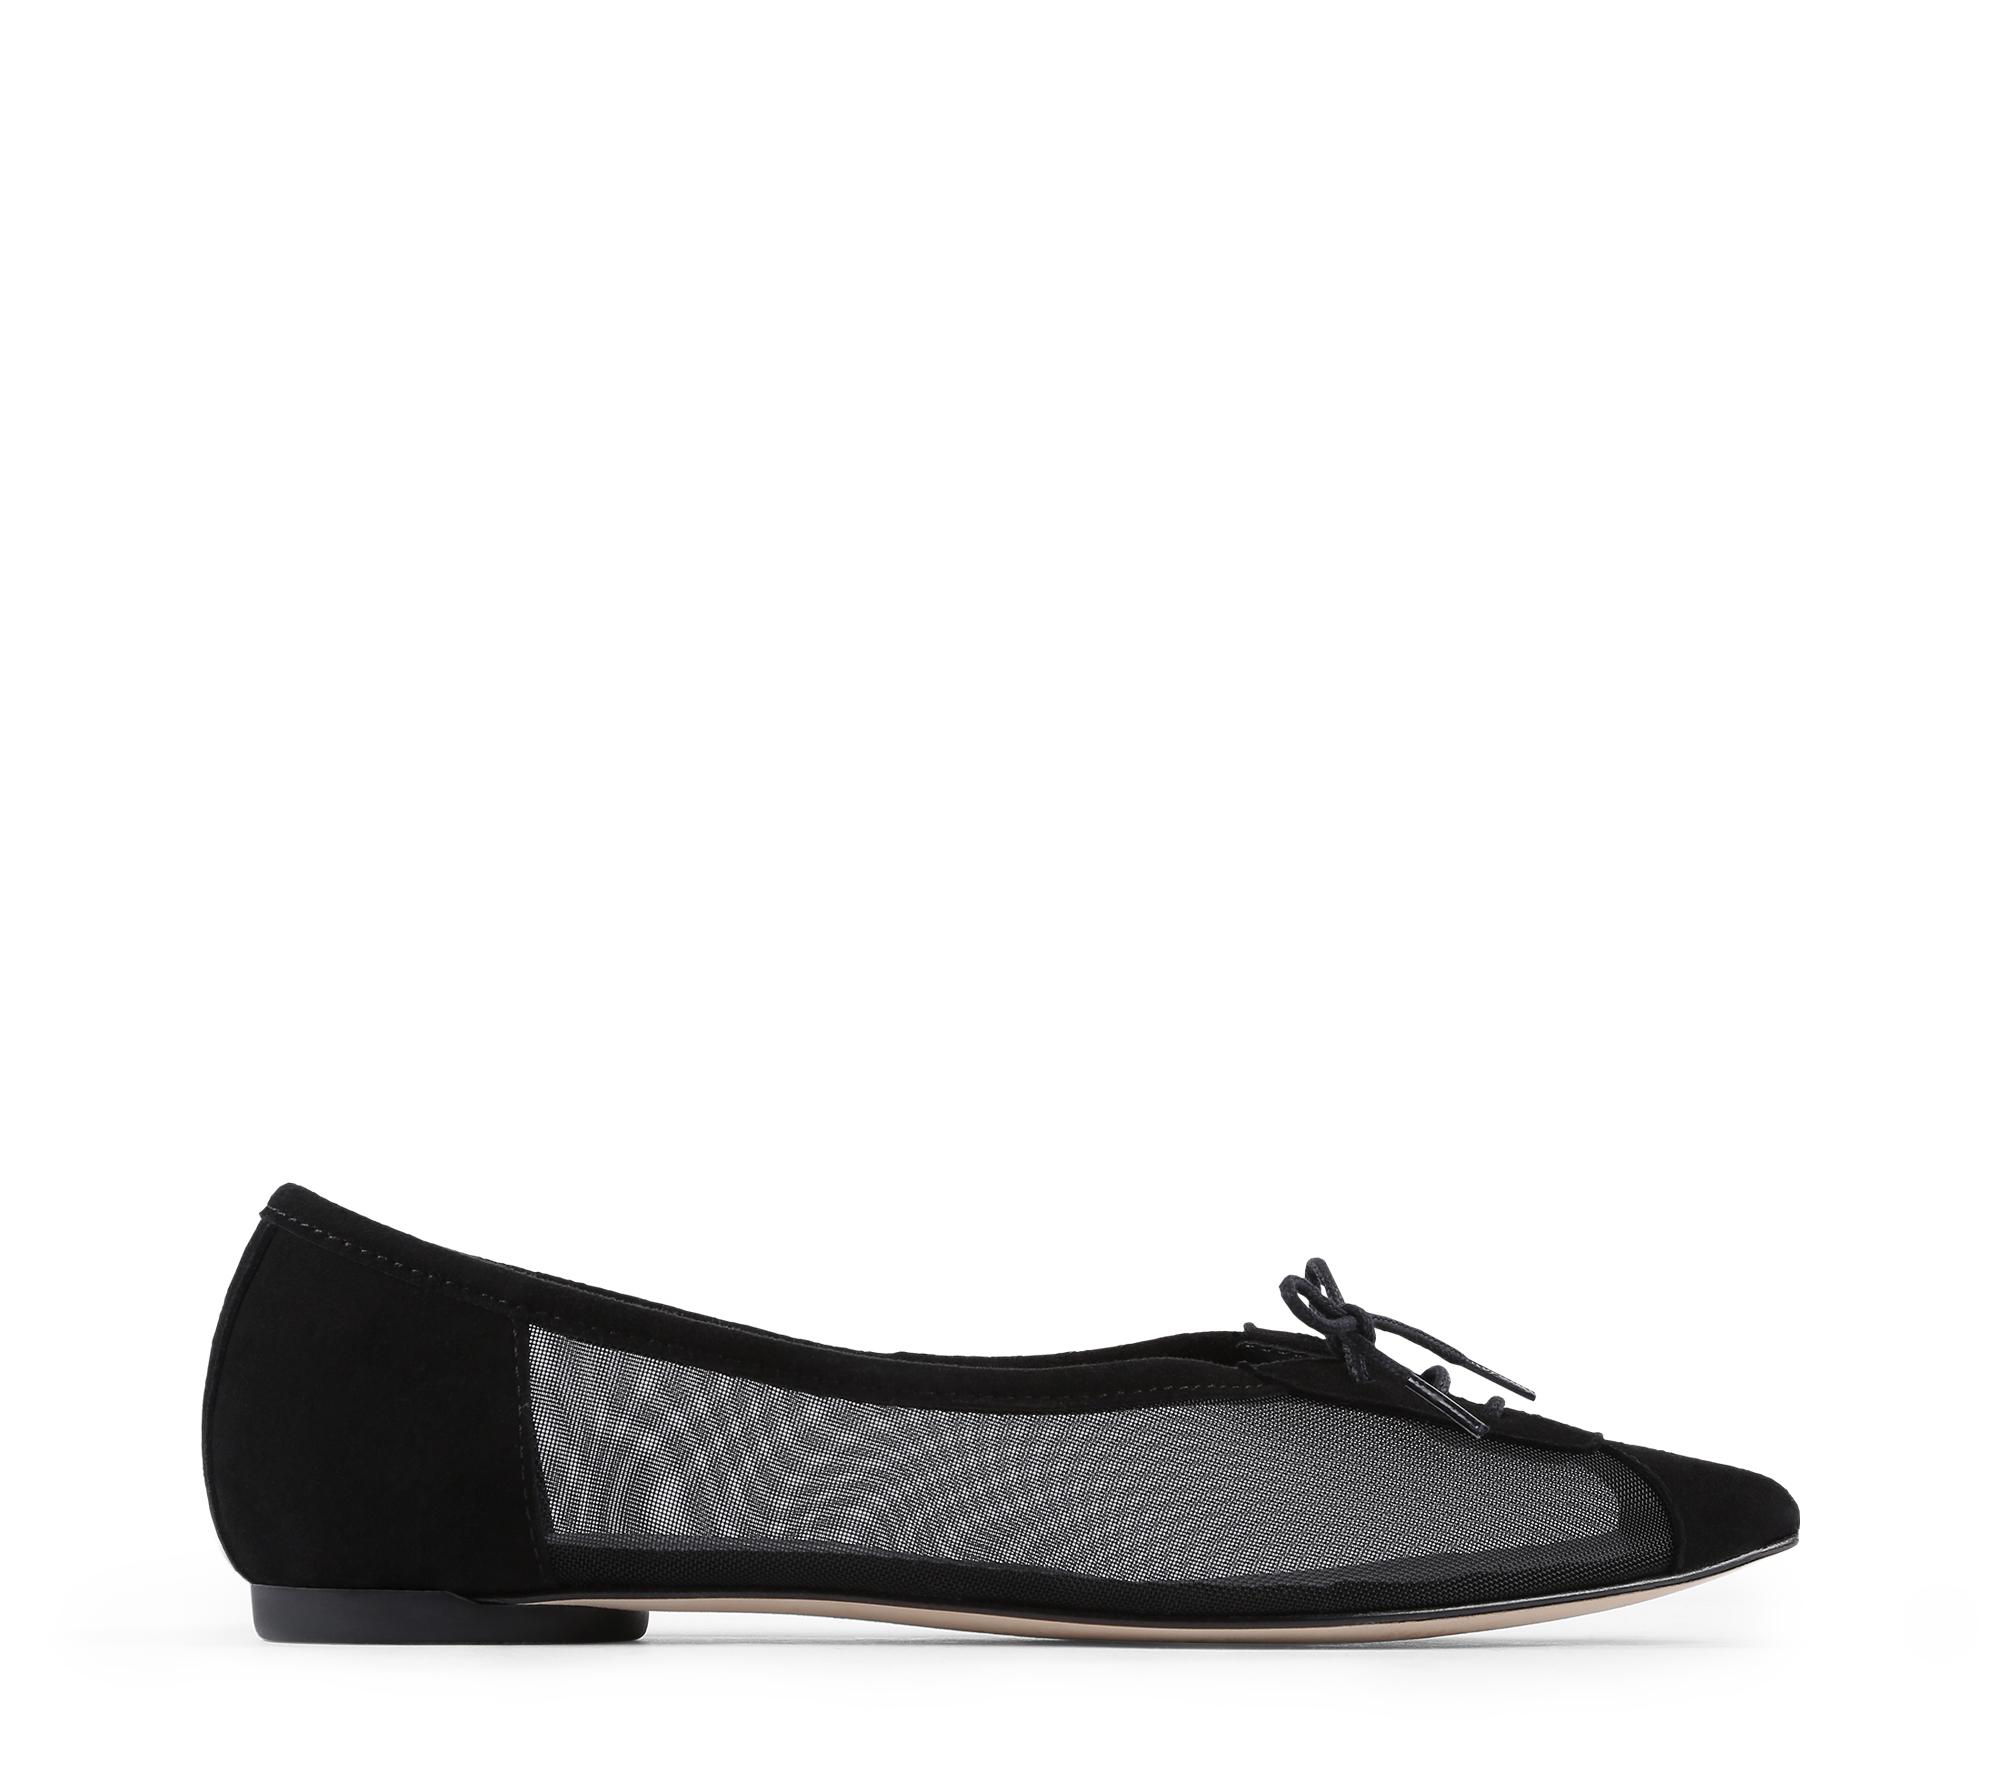 Morris oxford shoes